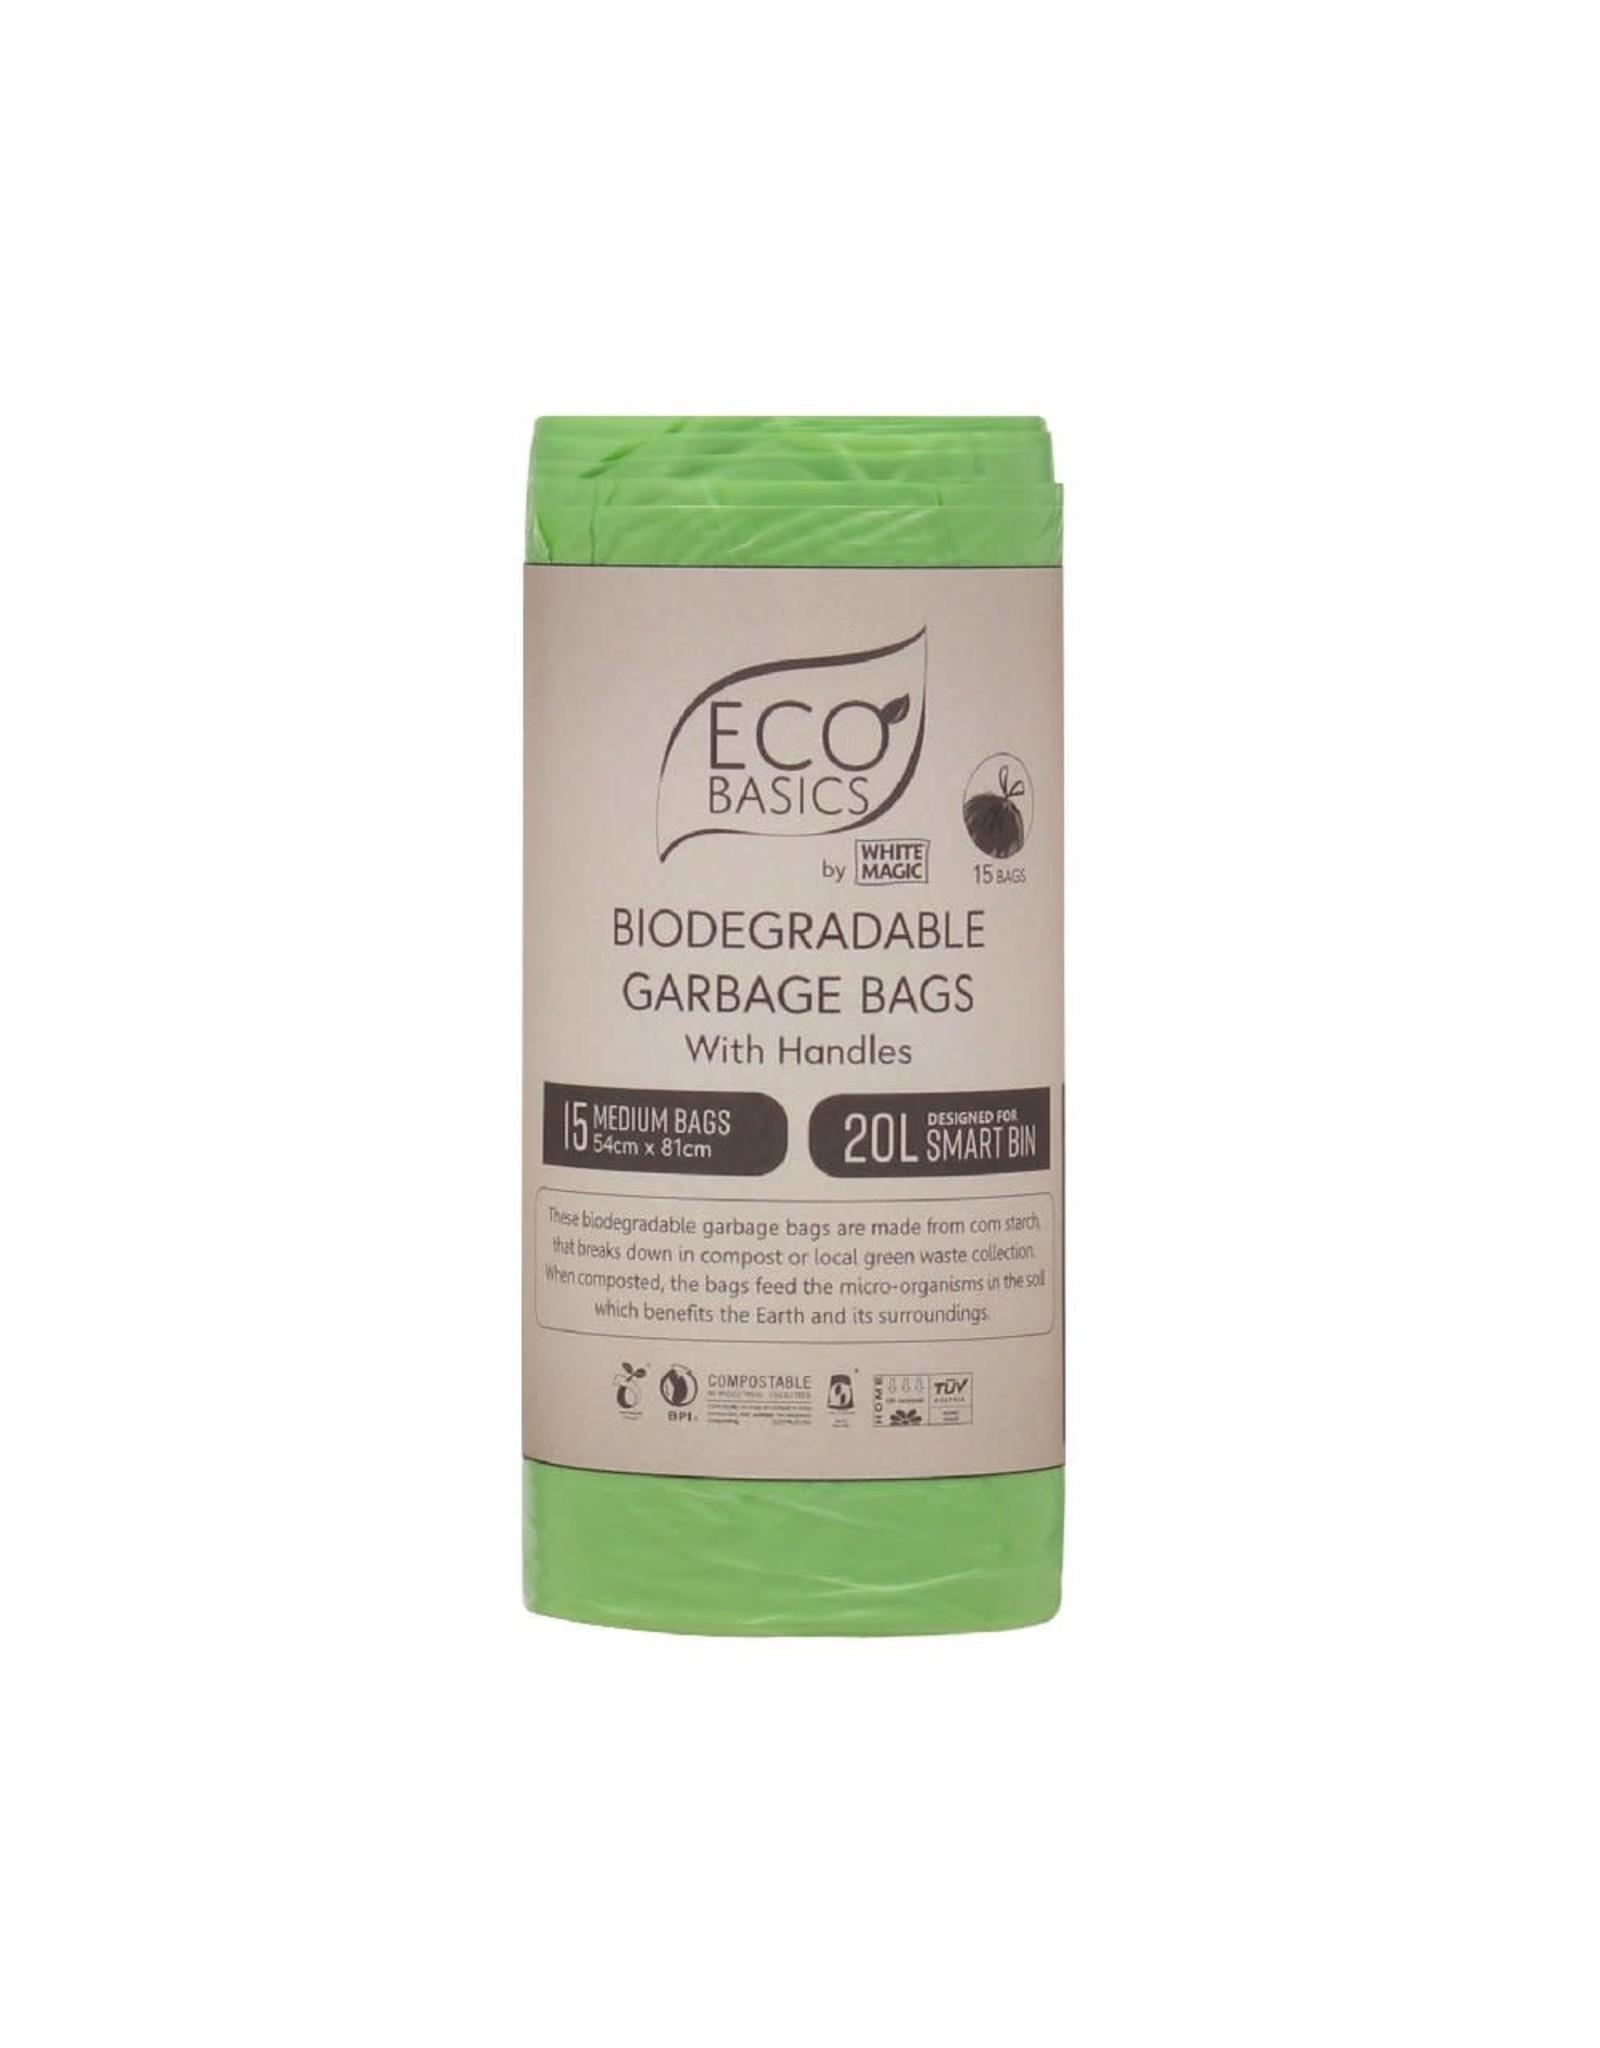 Eco Basics Biodegradable Garbage Bags